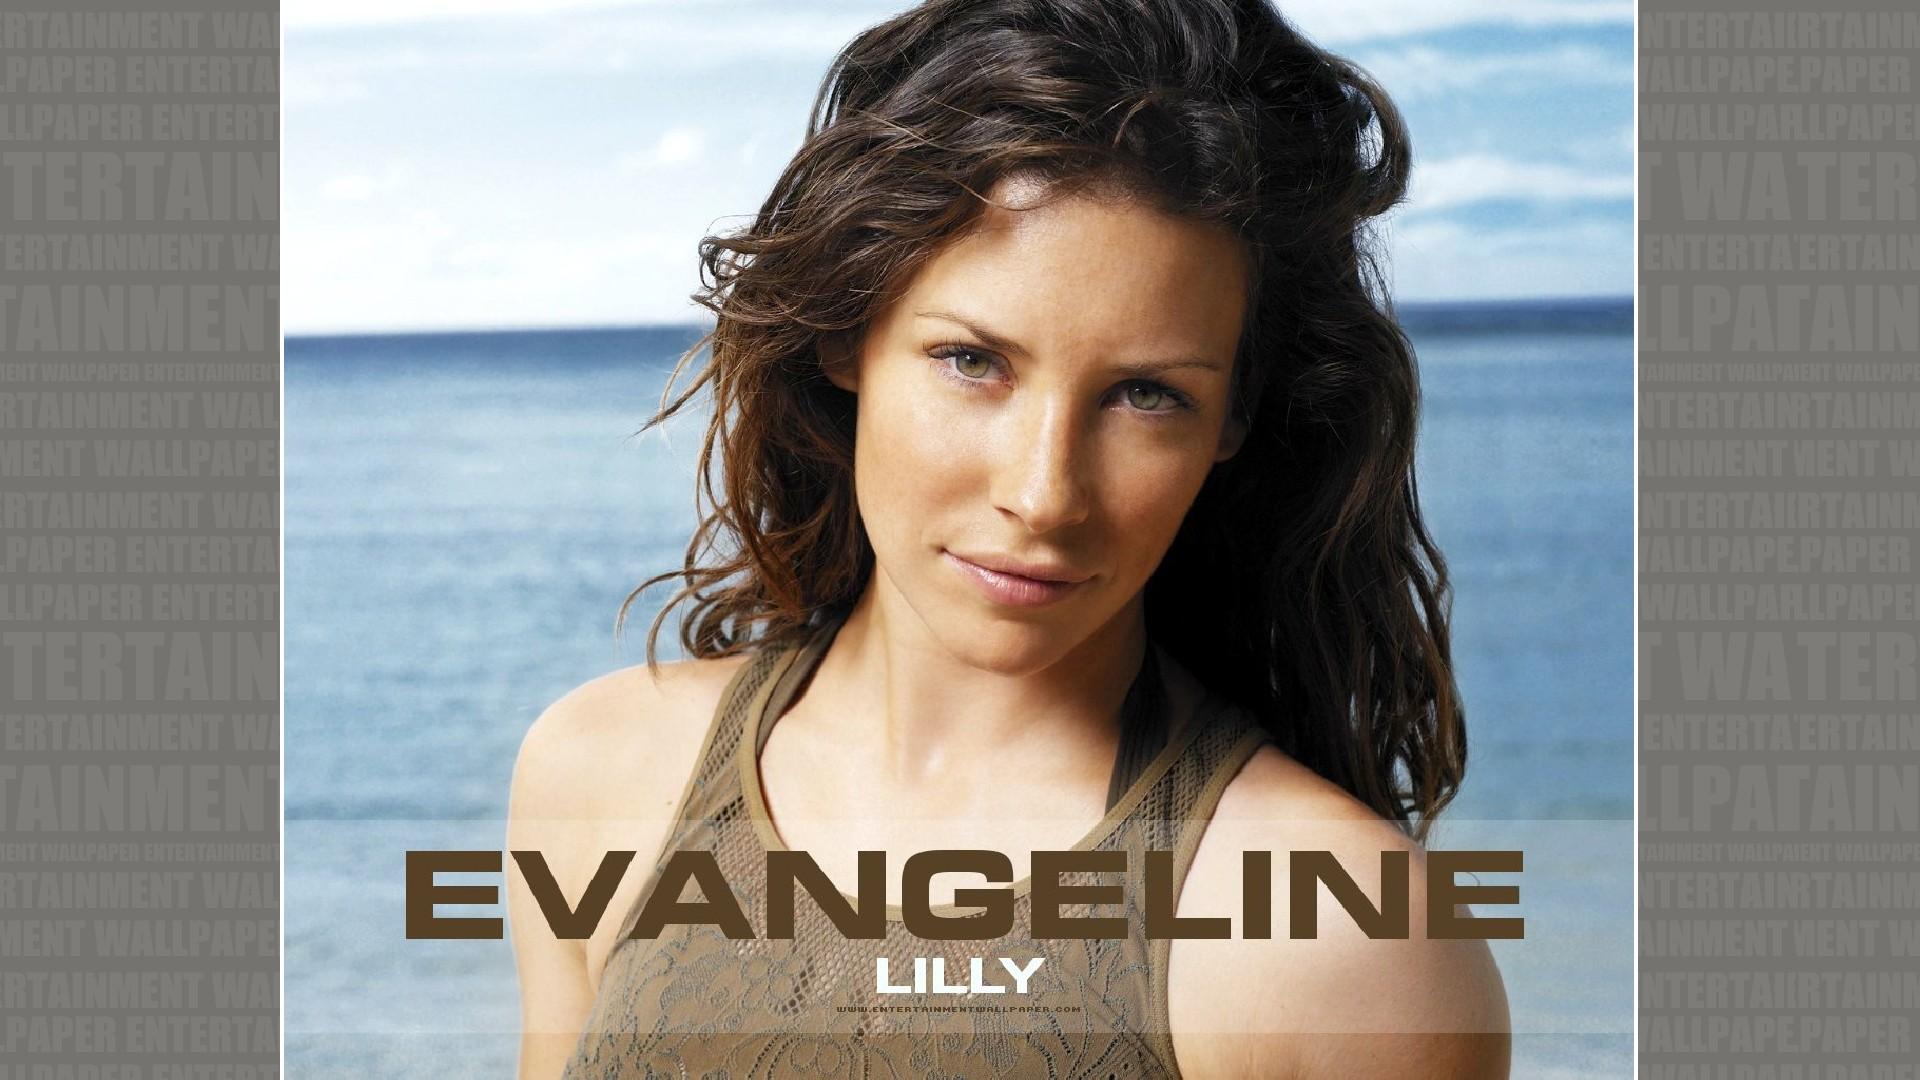 Evangeline Lilly Wallpaper   60012426 1920x1080 Desktop Download 1920x1080